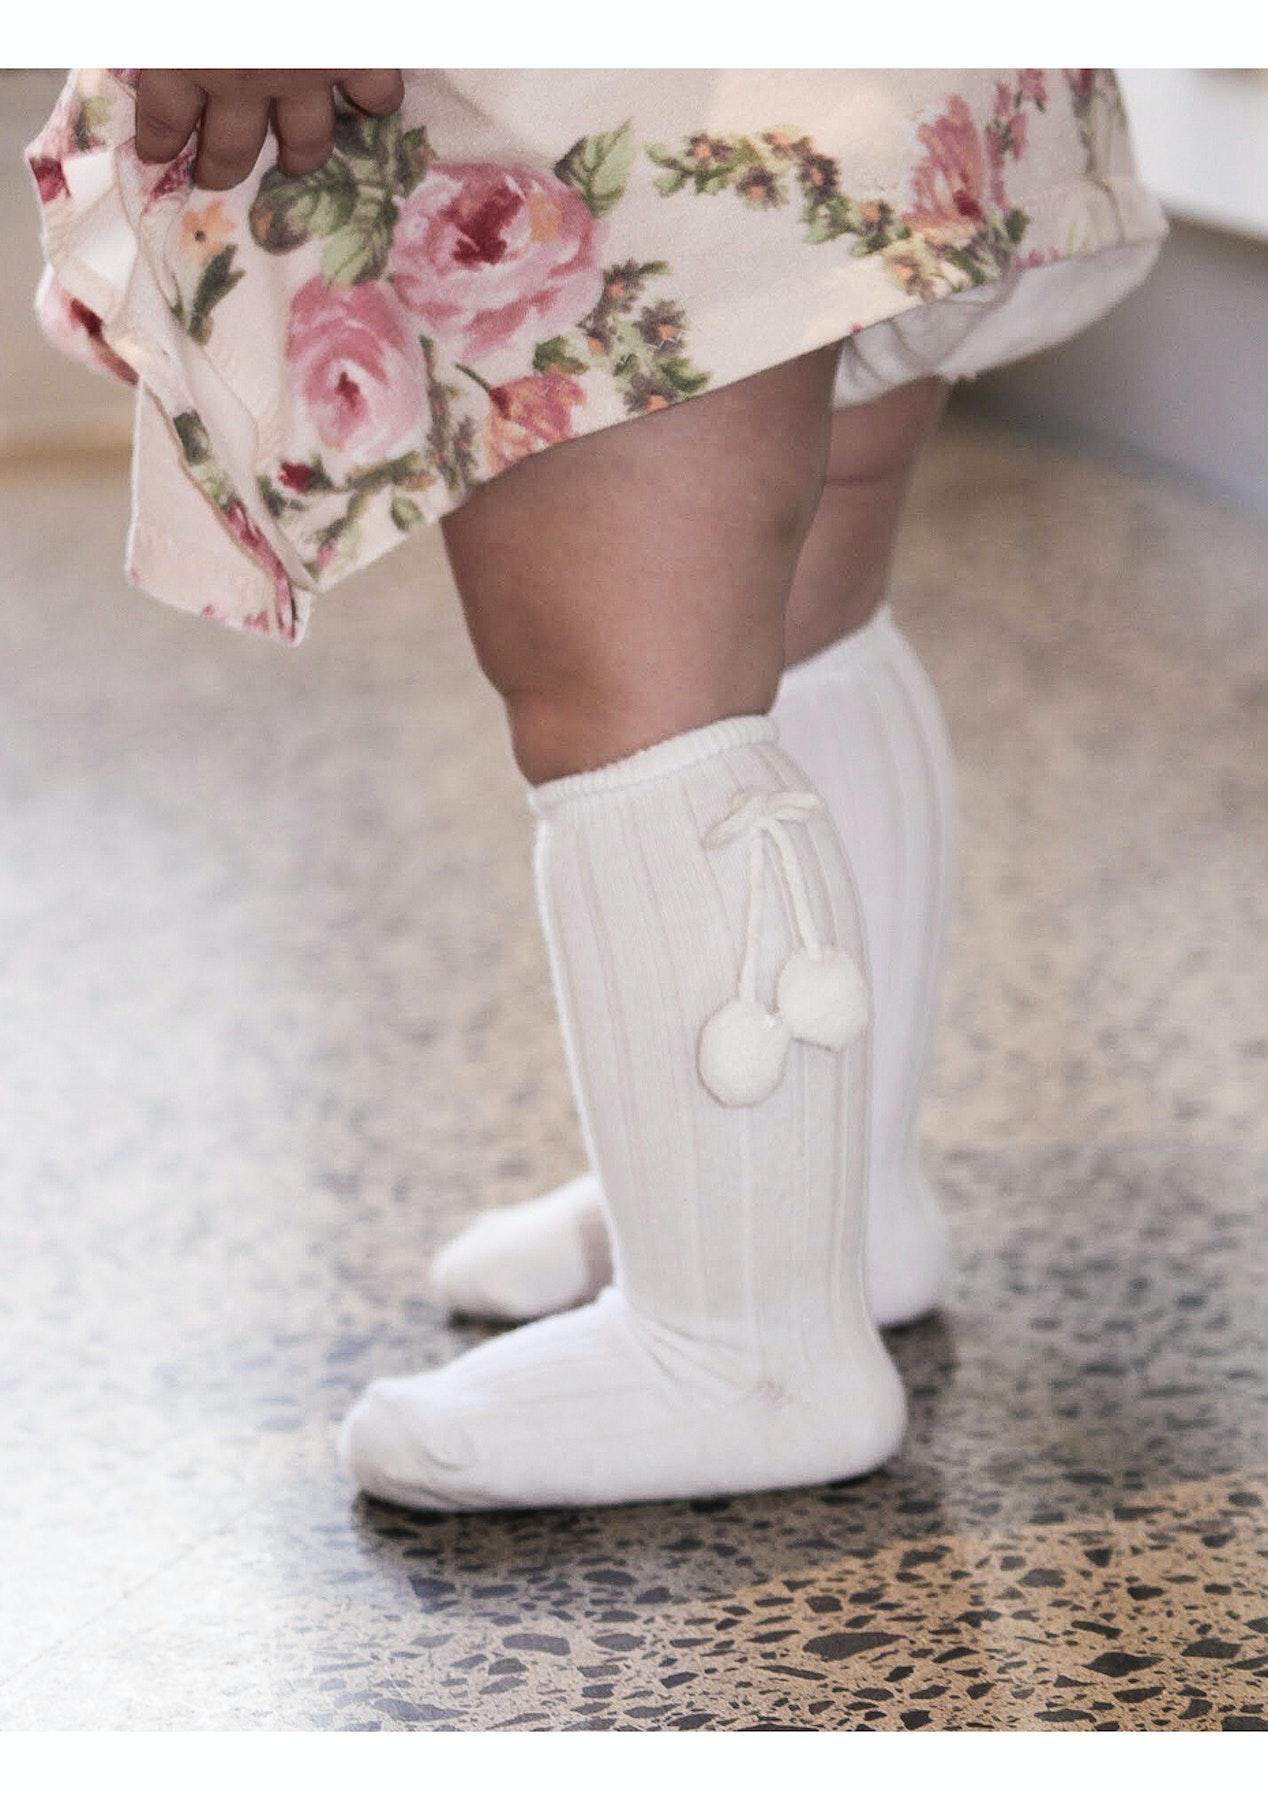 82f816666 Pom Pom Socks White - 2 Pack Bundle - Baby Shower and Nursery Sale - Onceit